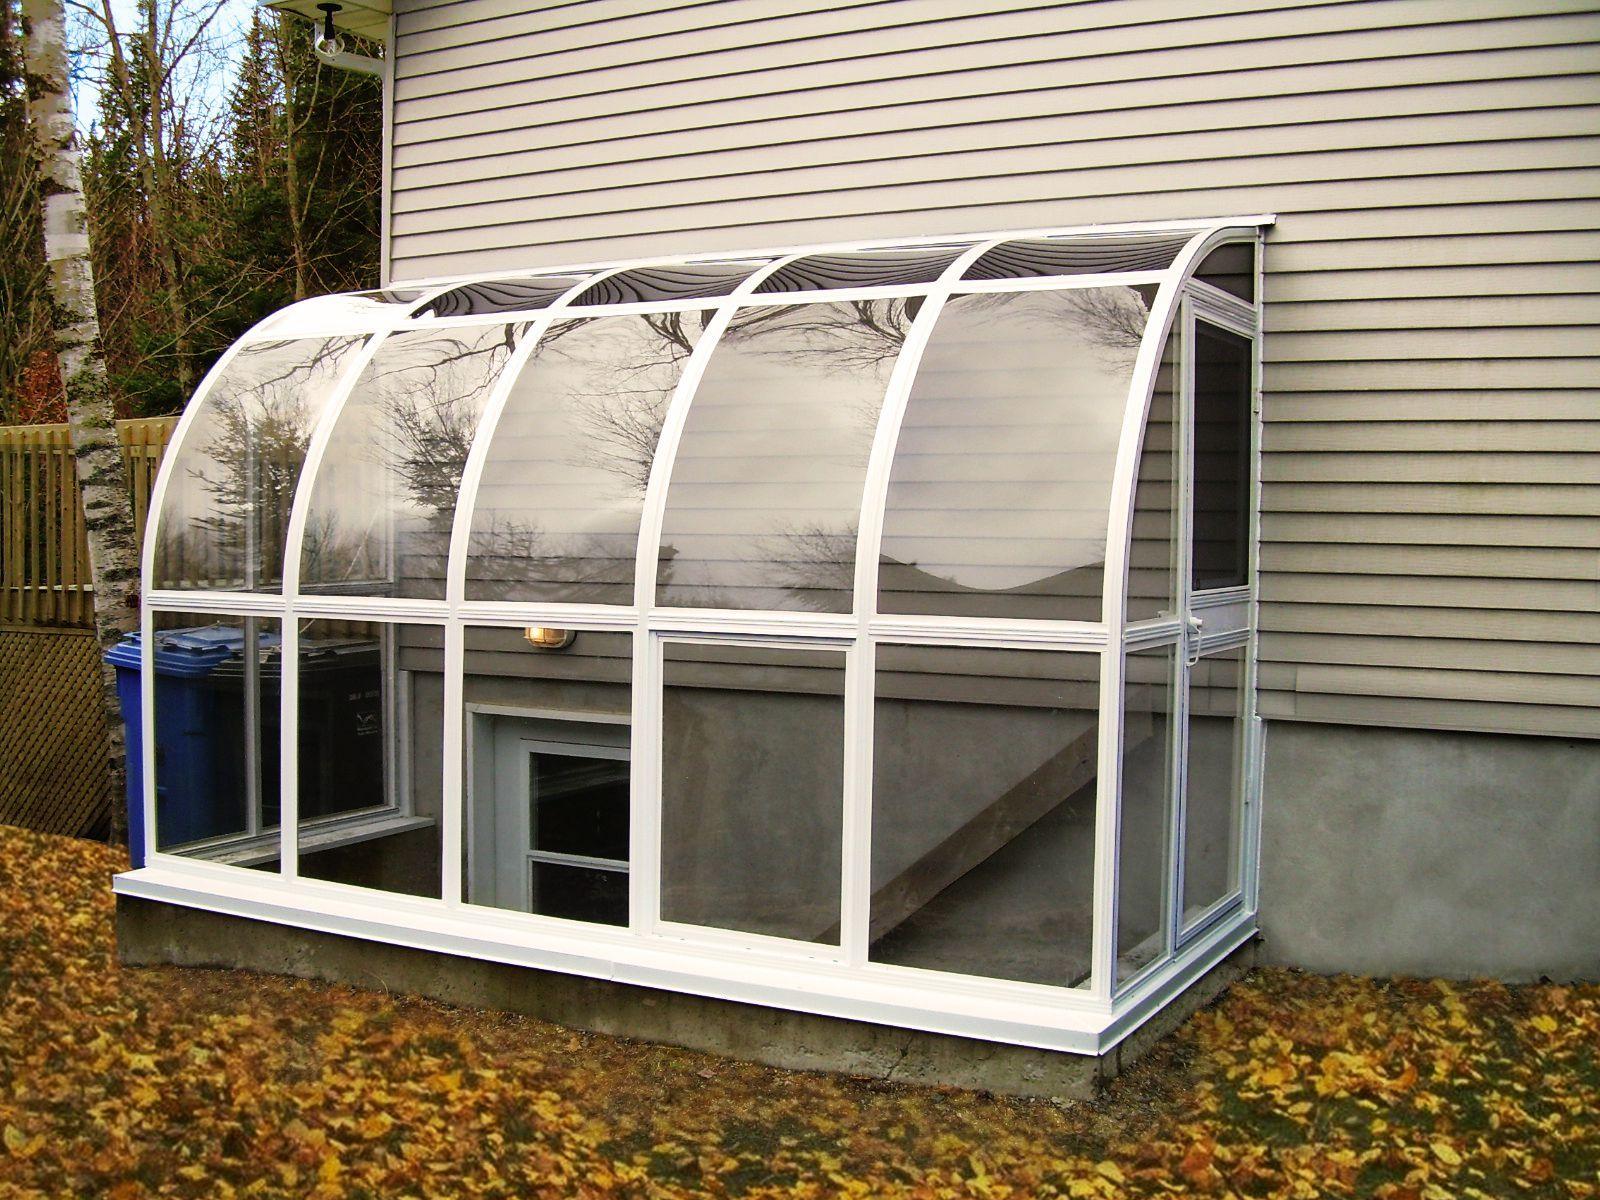 Solarium De Paris 3 Seasons Sunroom Gazebo Shelter Railing And